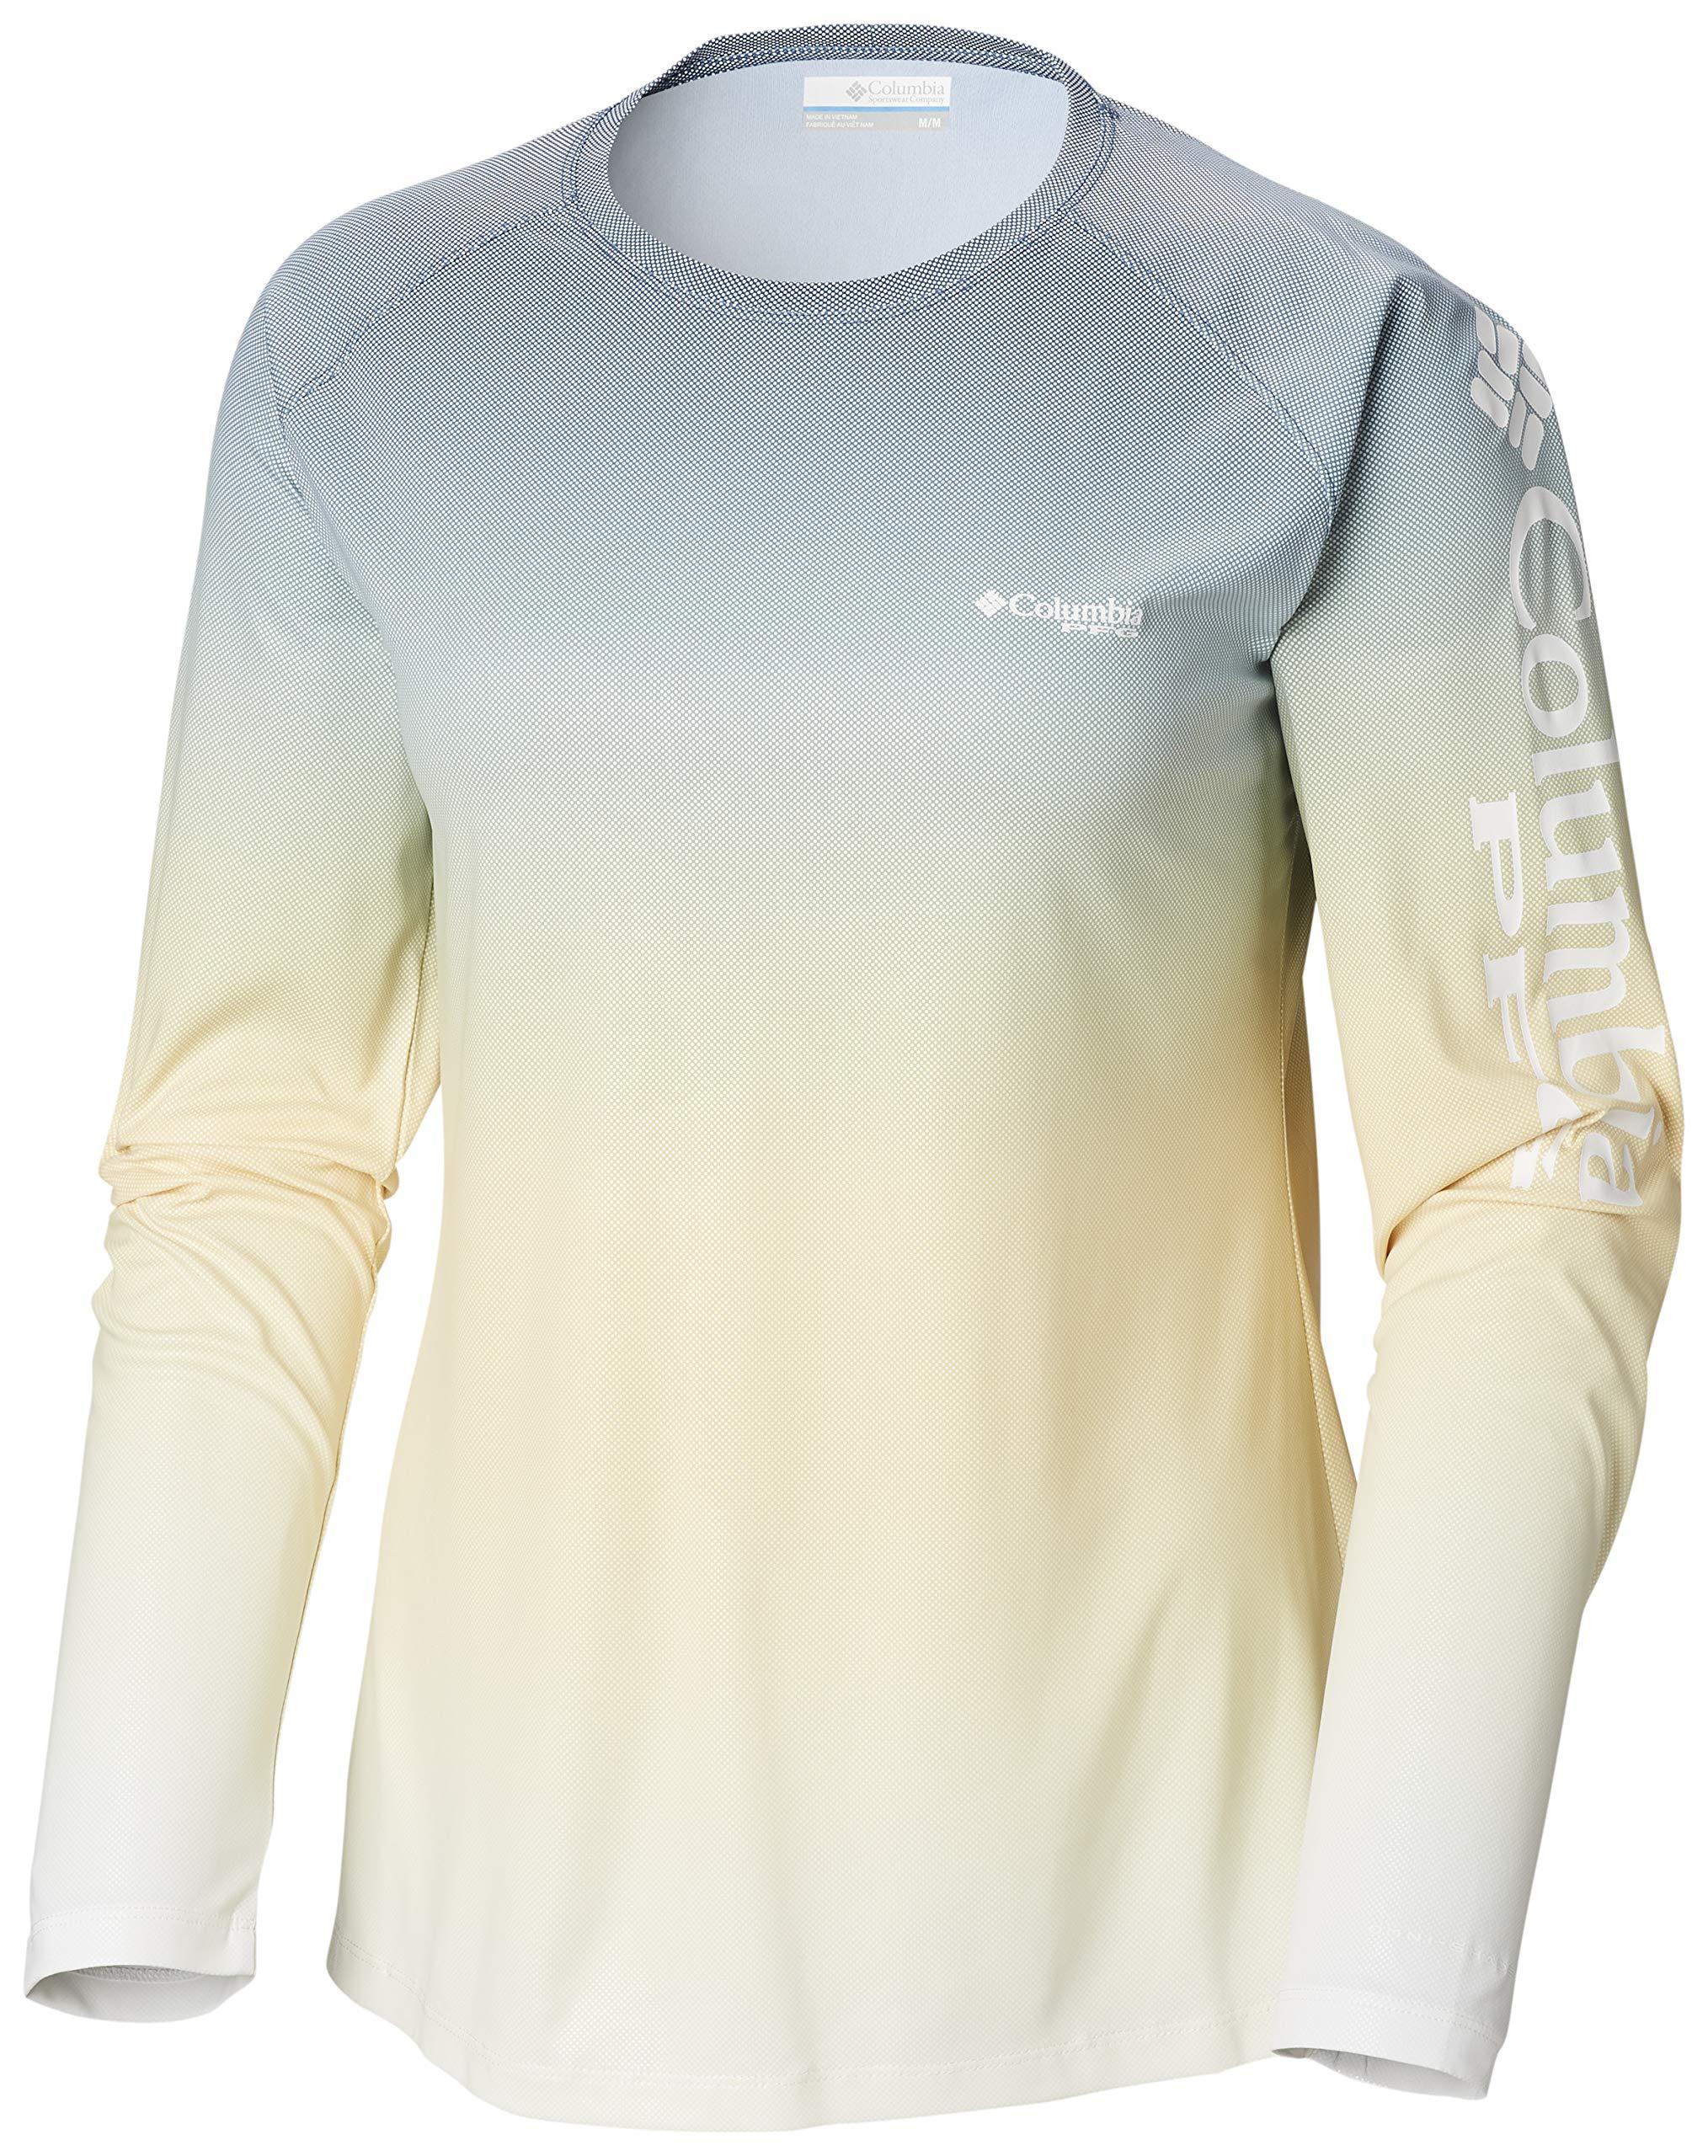 Columbia Women's PFG Tidal Deflector Long Sleeve Shirt ,Carbon Fade,Medium by Columbia